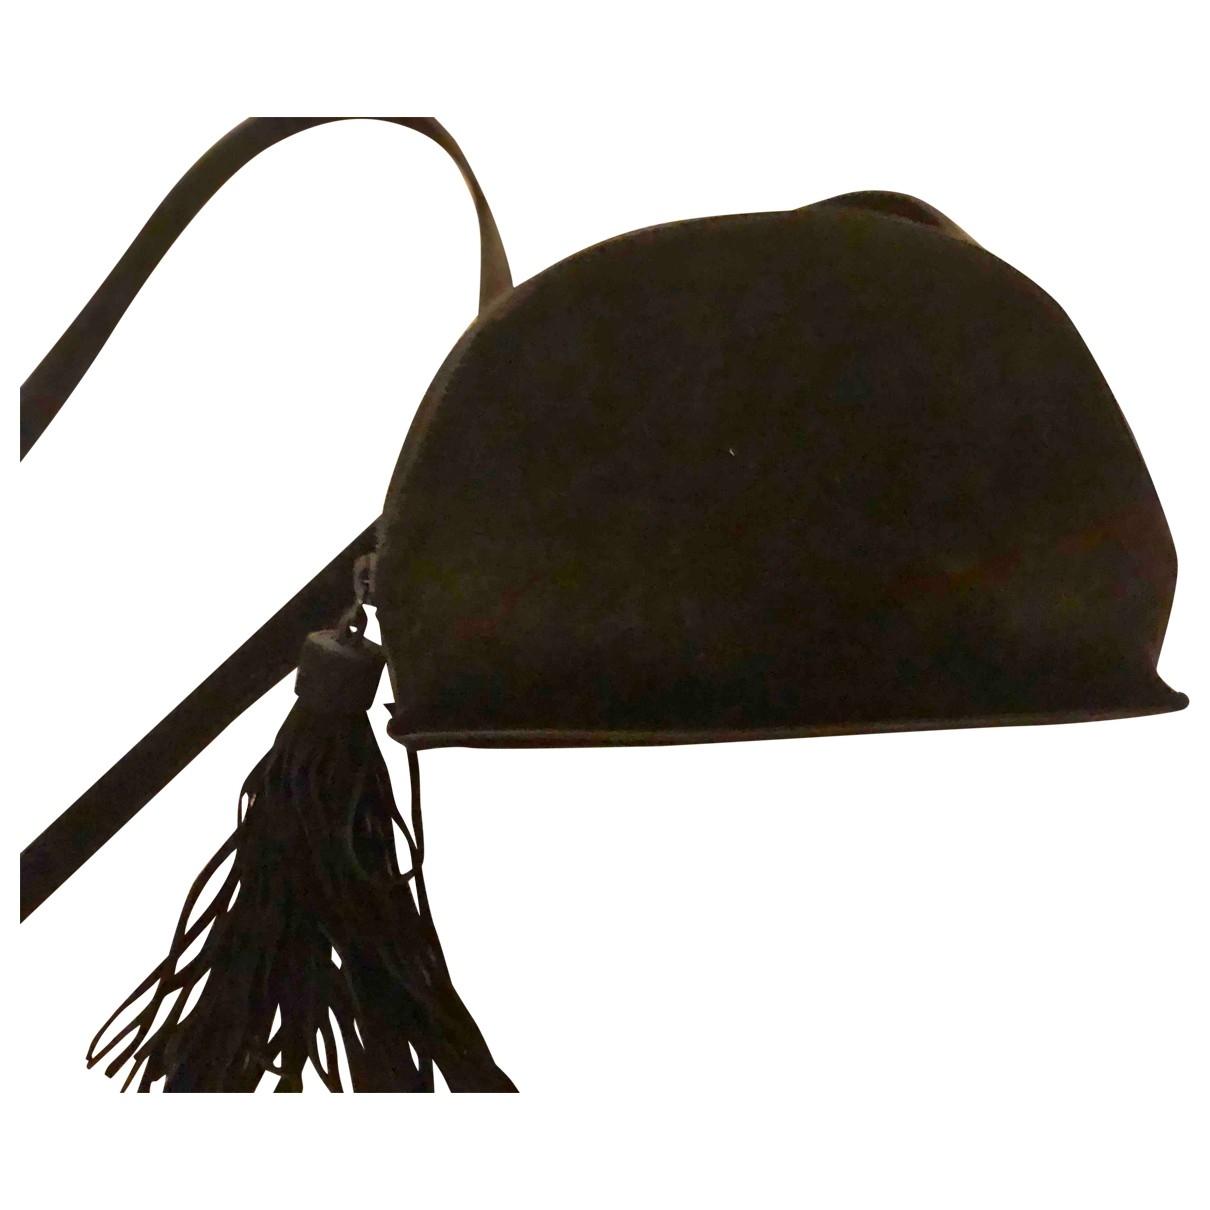 Loeffler Randall \N Handtasche in  Schwarz Veloursleder